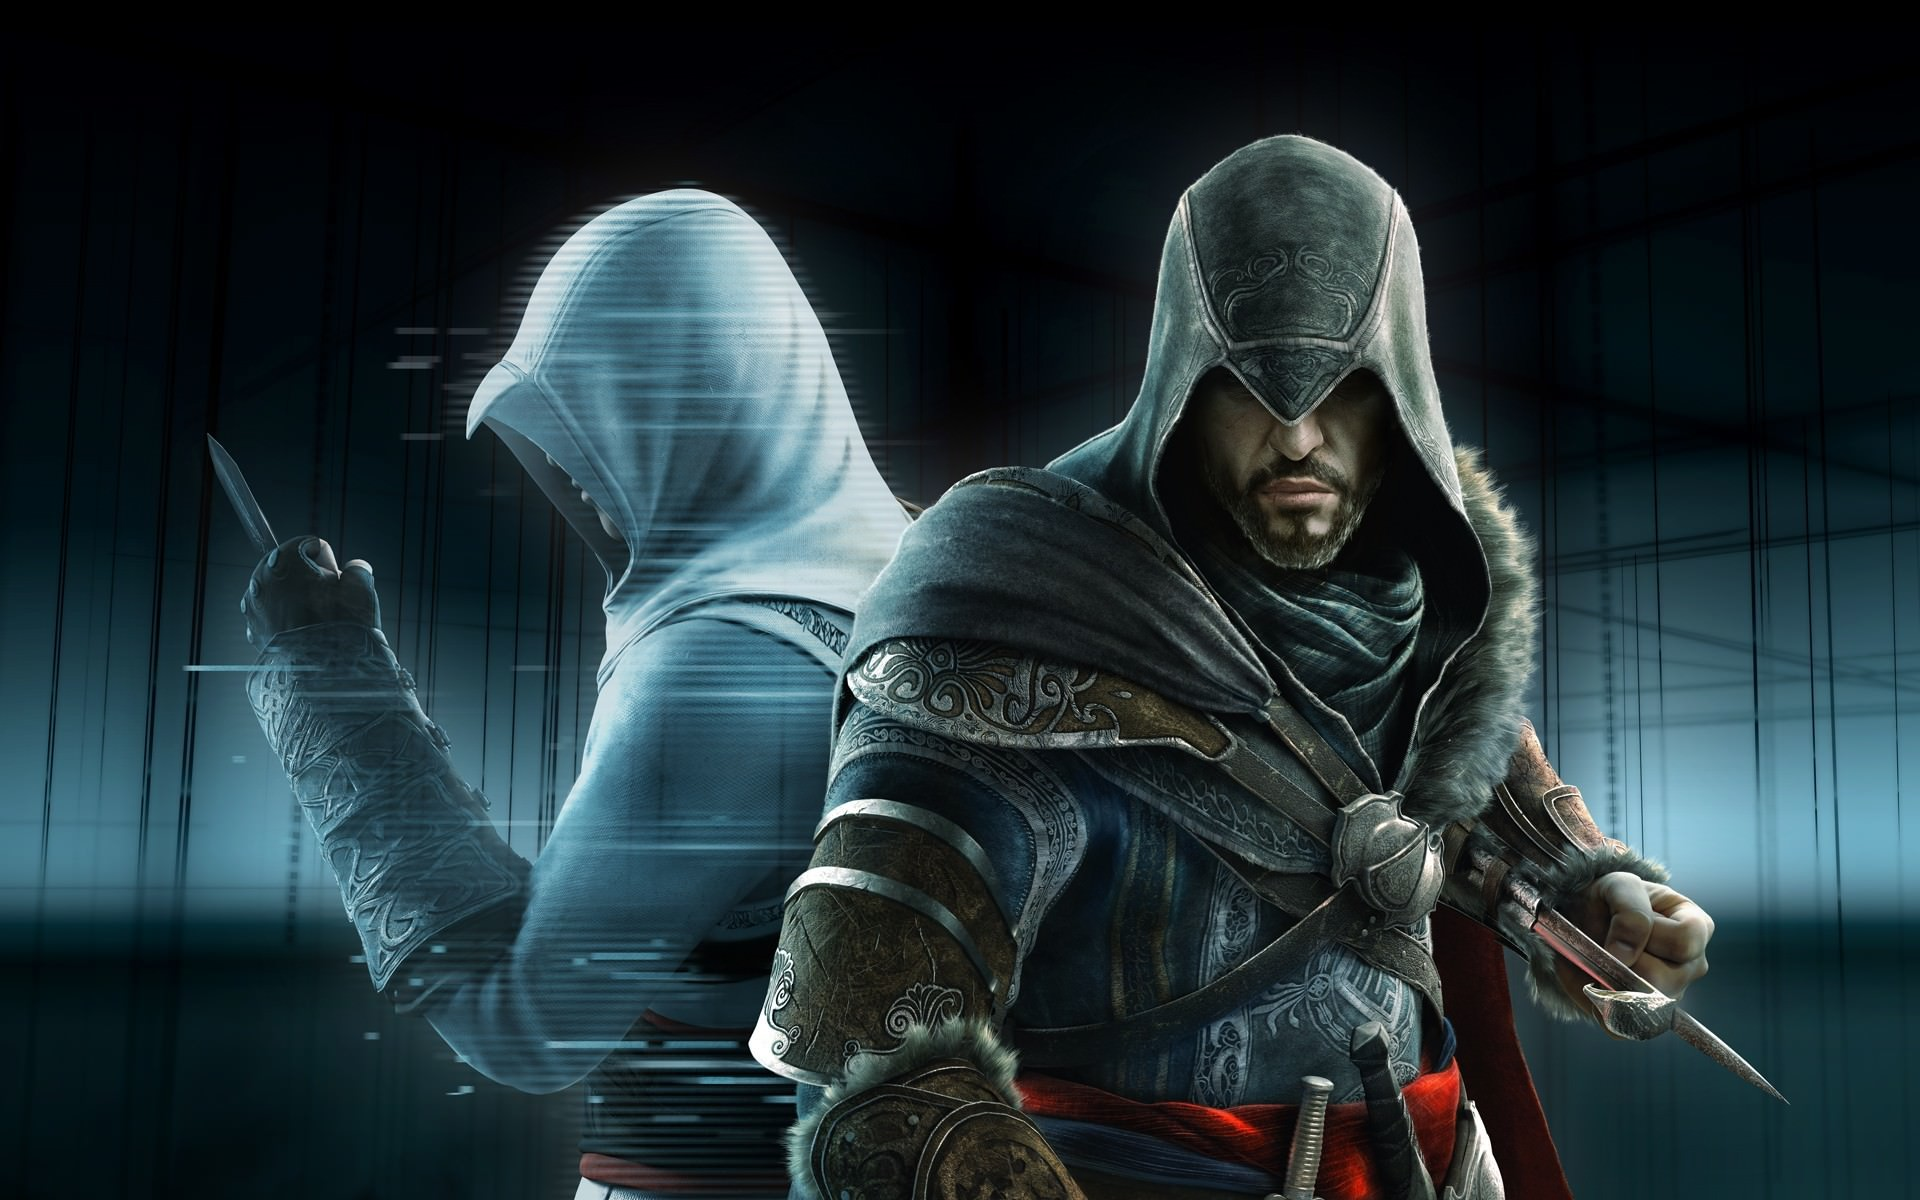 Download Cool Video Game HD Desktop Background